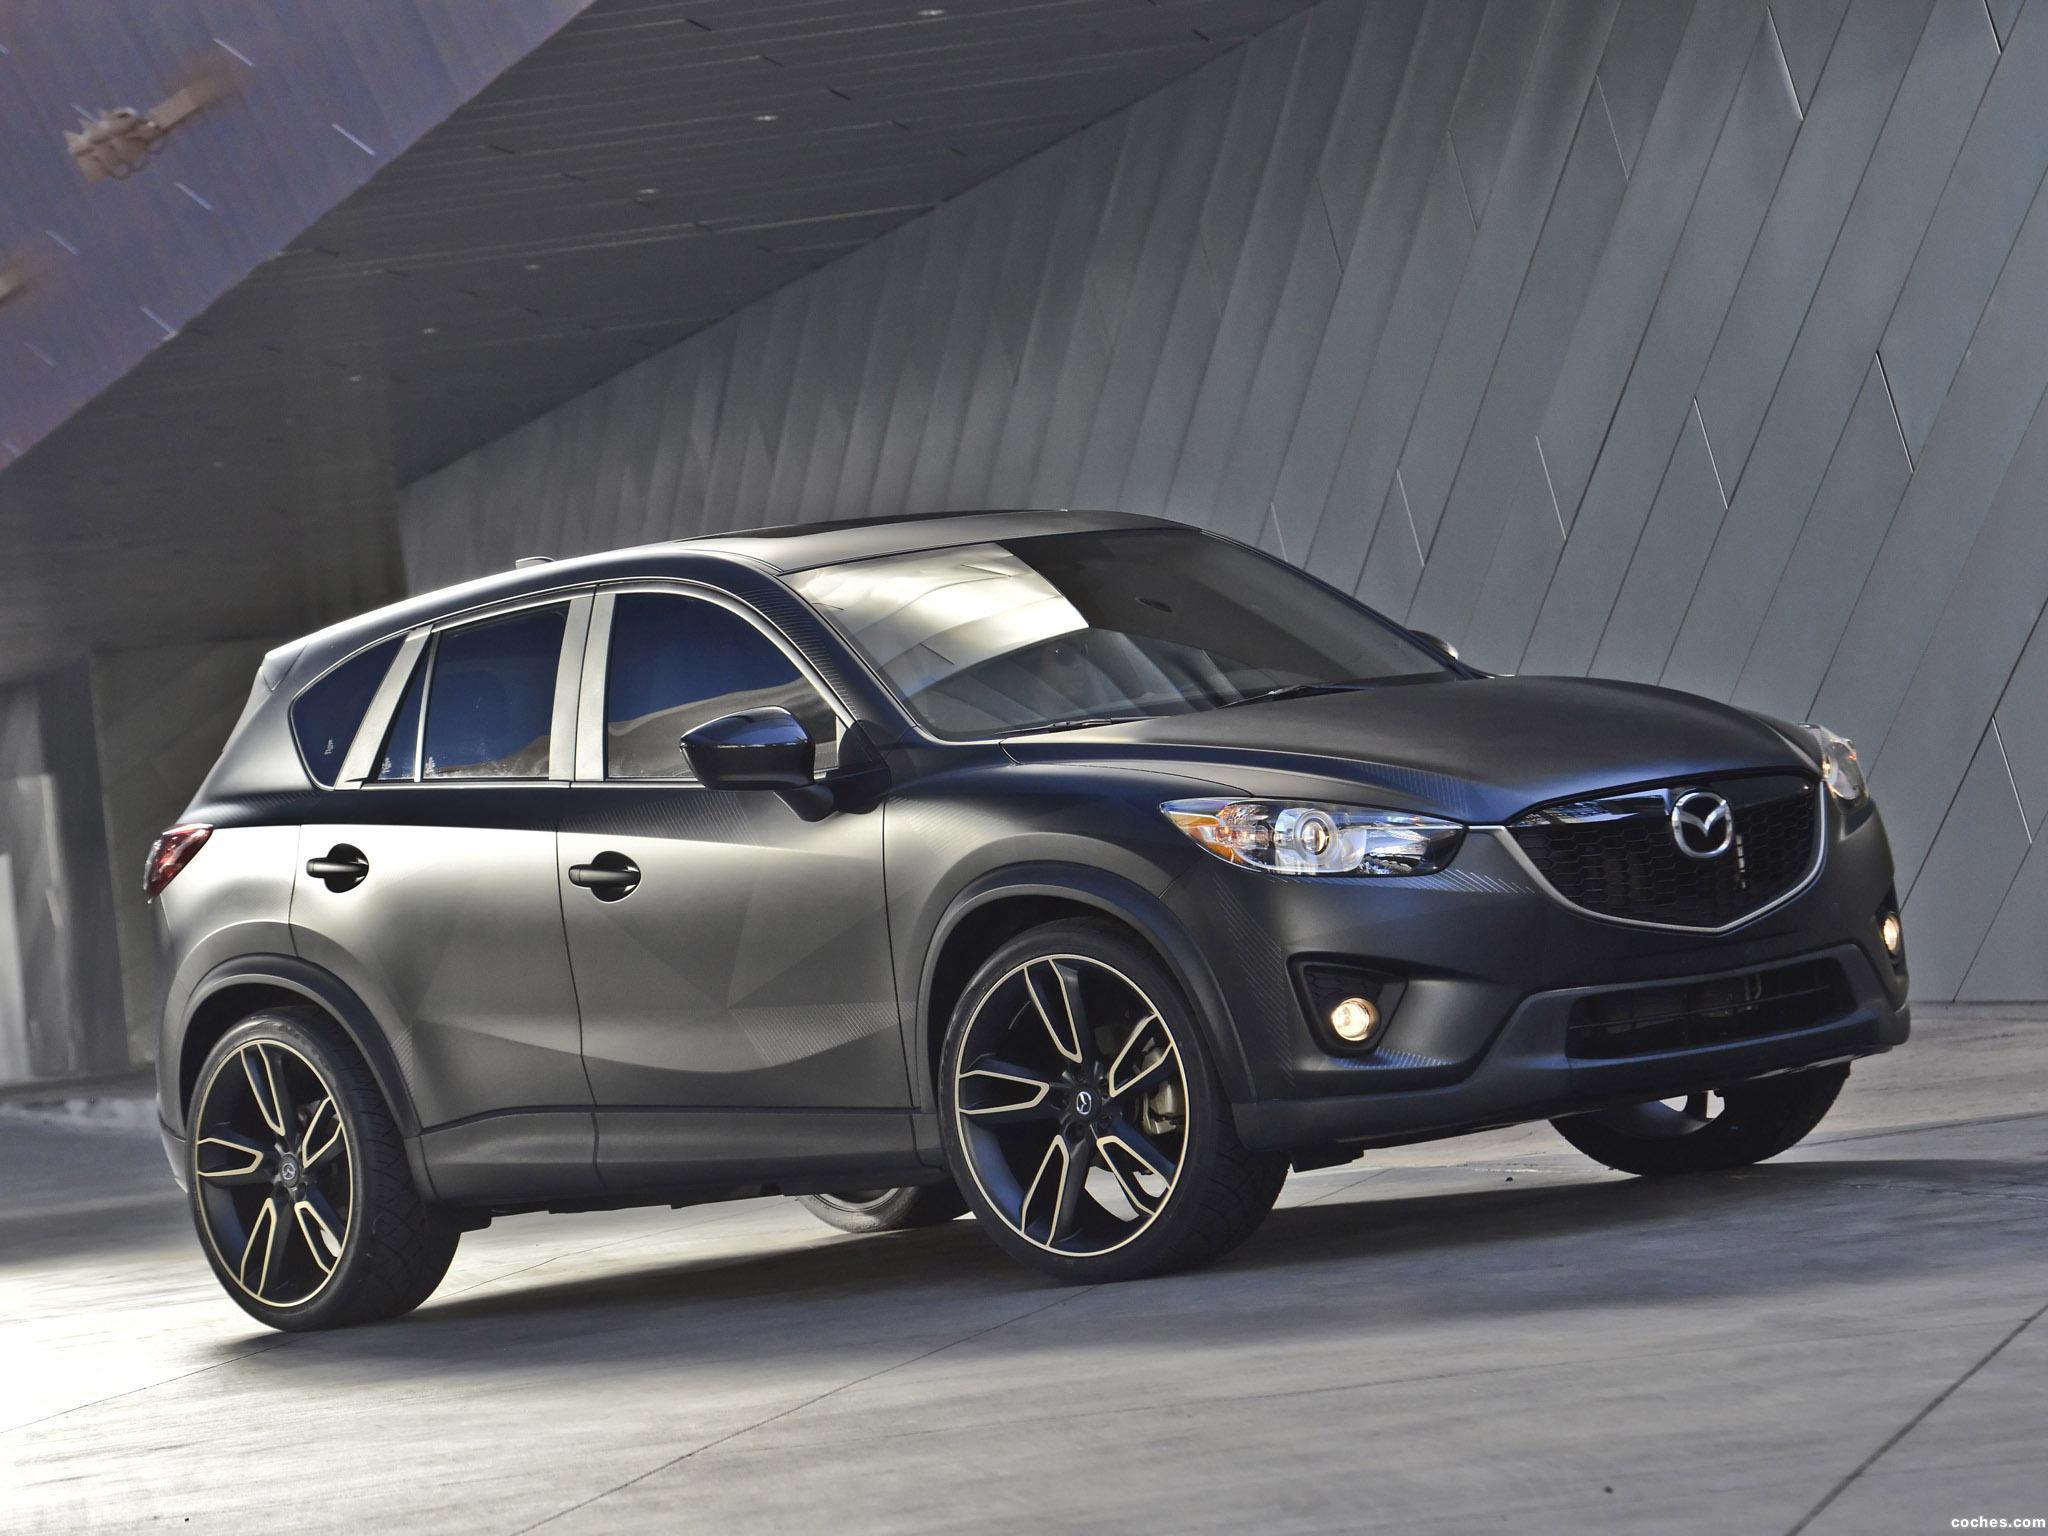 Foto 1 de Mazda CX-5 Urban Concept 2012